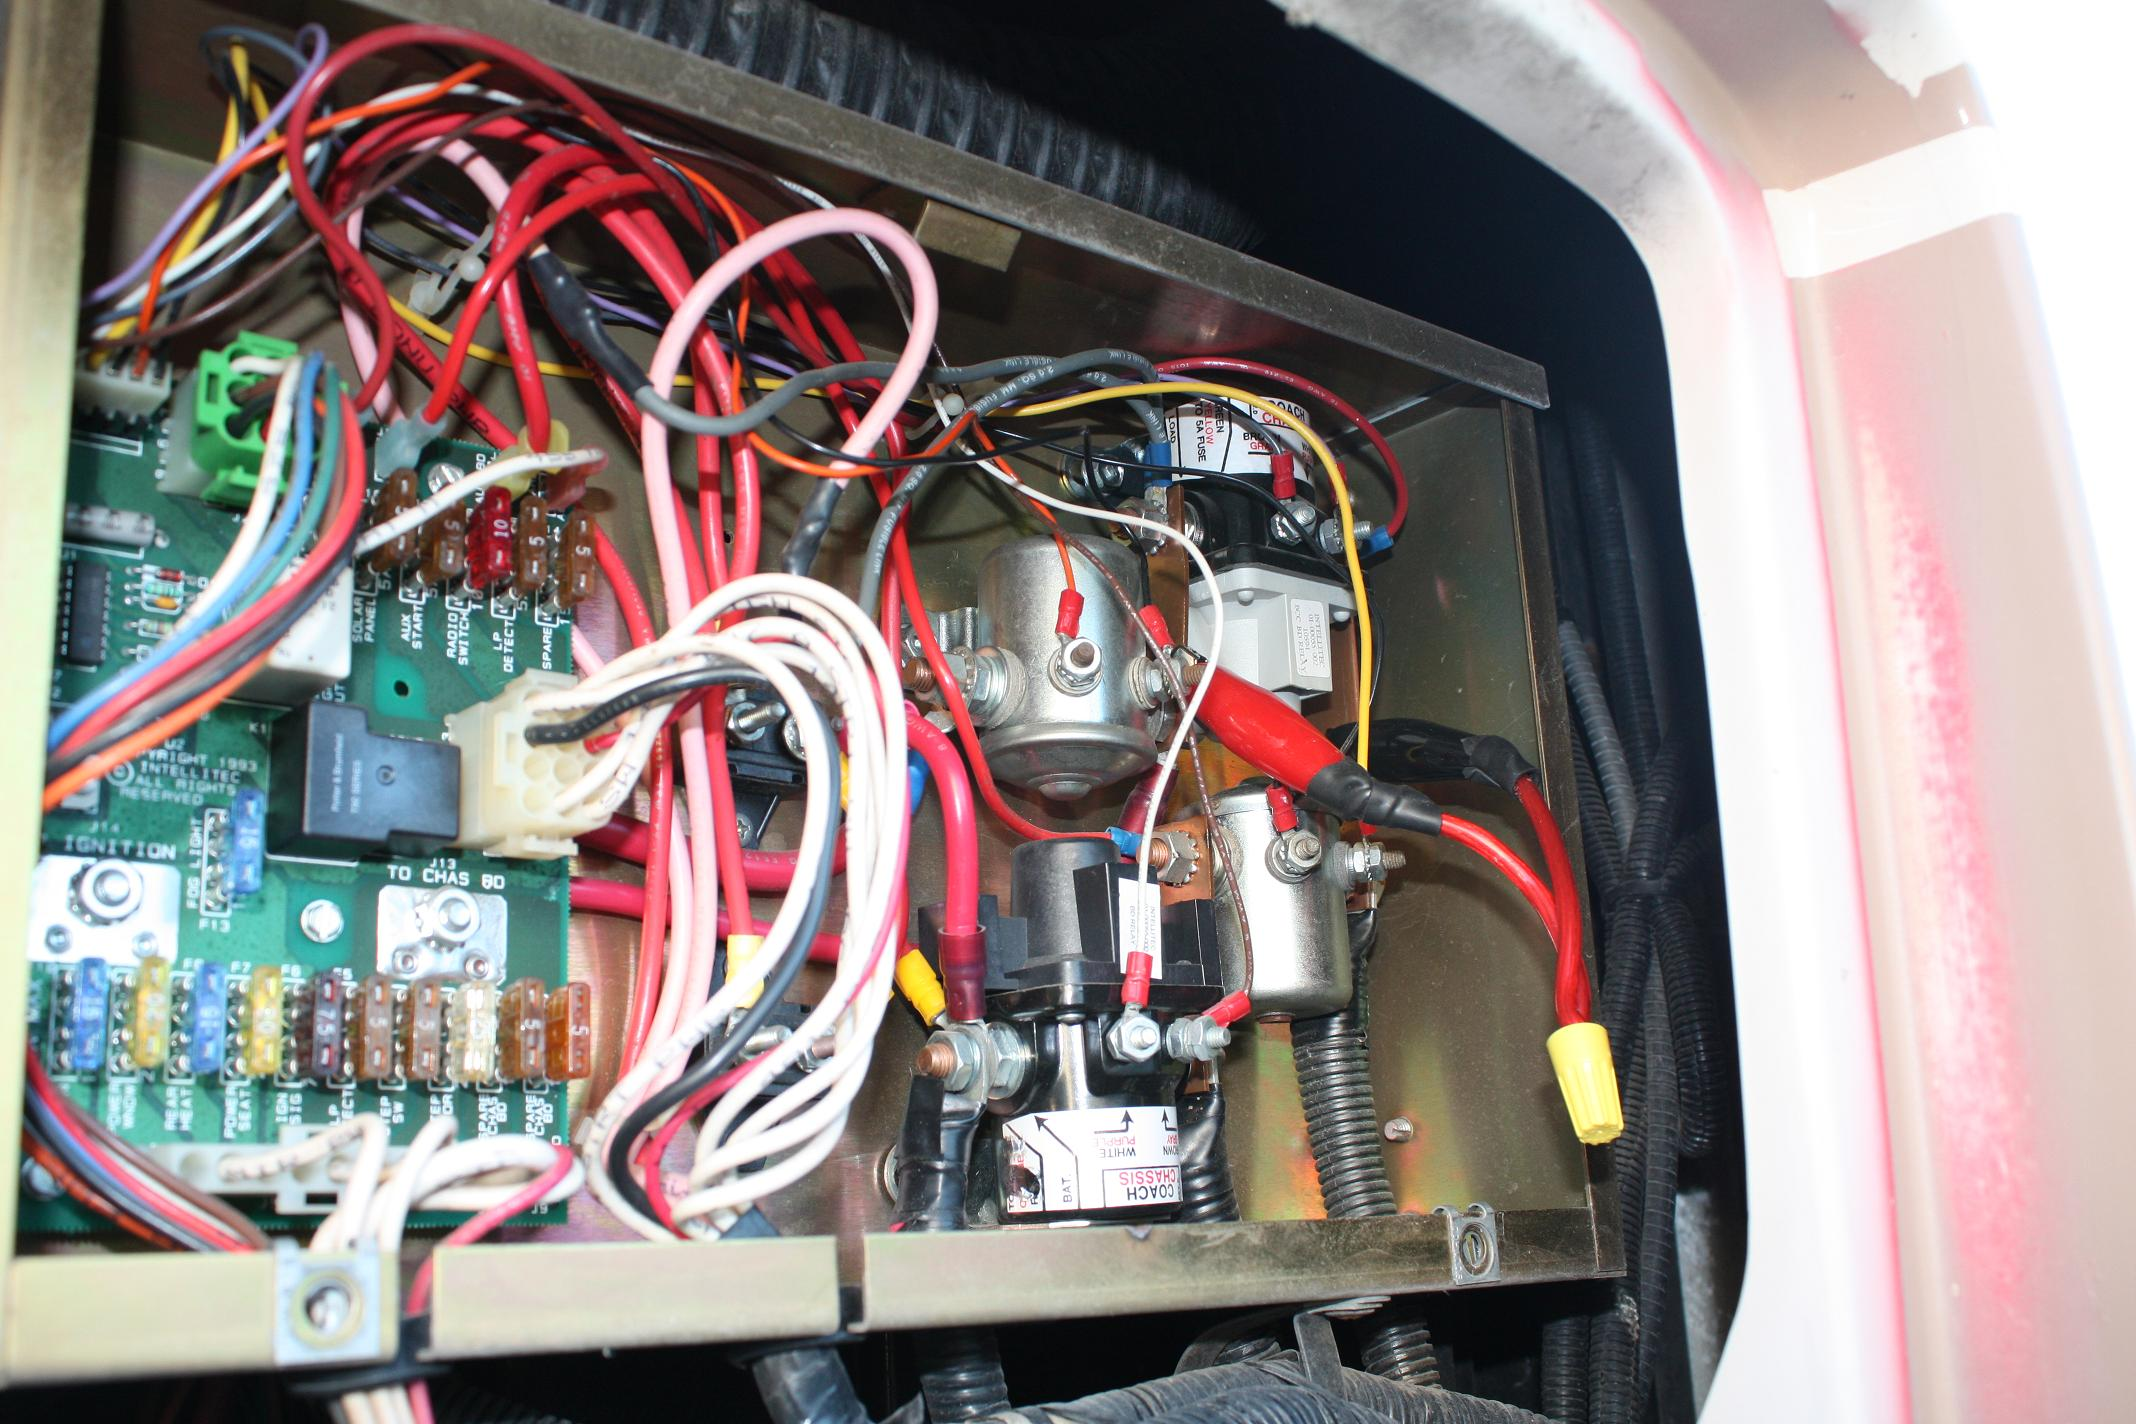 [DIAGRAM_4FR]  BS_9191] 1991 Pace Arrow Motorhome Battery Wiring Diagram Download Diagram | 1991 Pace Arrow Motorhome Battery Wiring Diagram |  | Ixtu Nowa Orsal Emba Mohammedshrine Librar Wiring 101